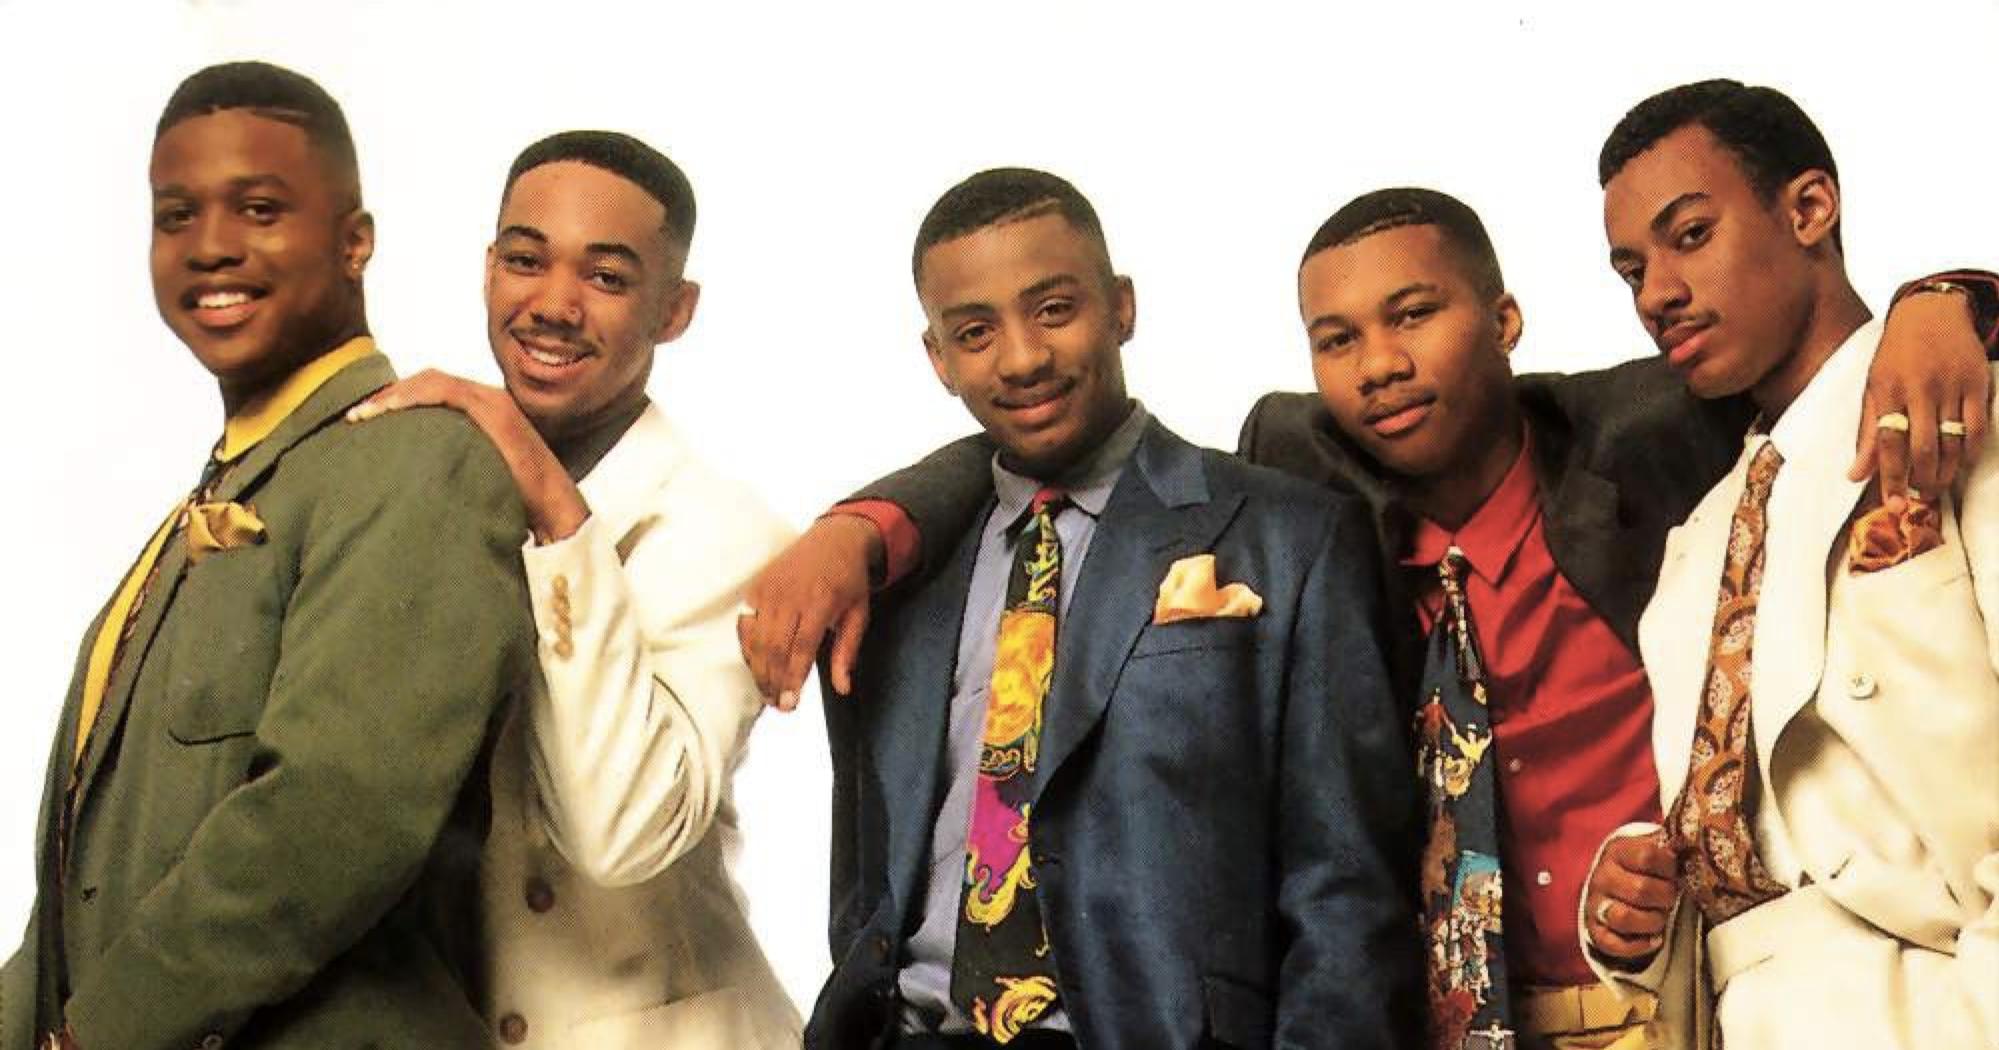 Remembering 90's R&B Group Singer, Tony Thompson